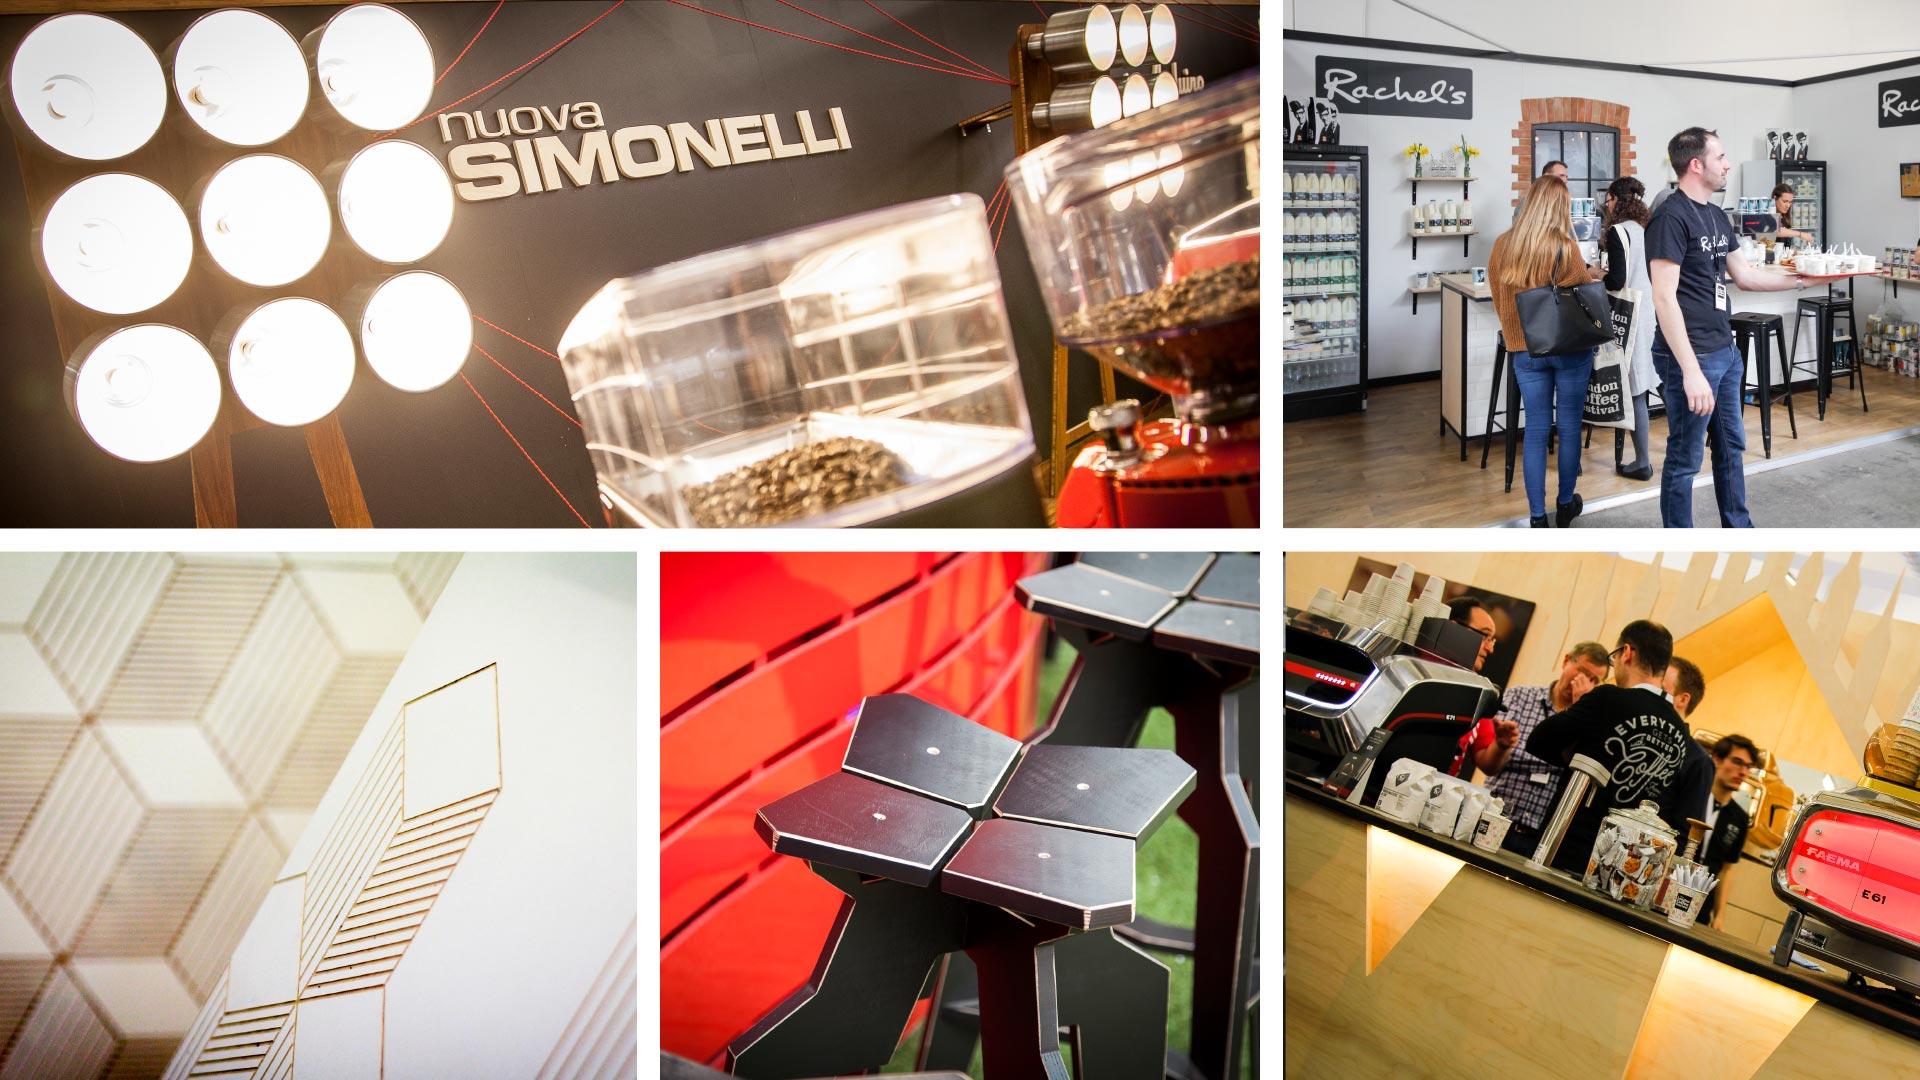 Exhibition Stand Design In Uk : Exhibition stand design designers